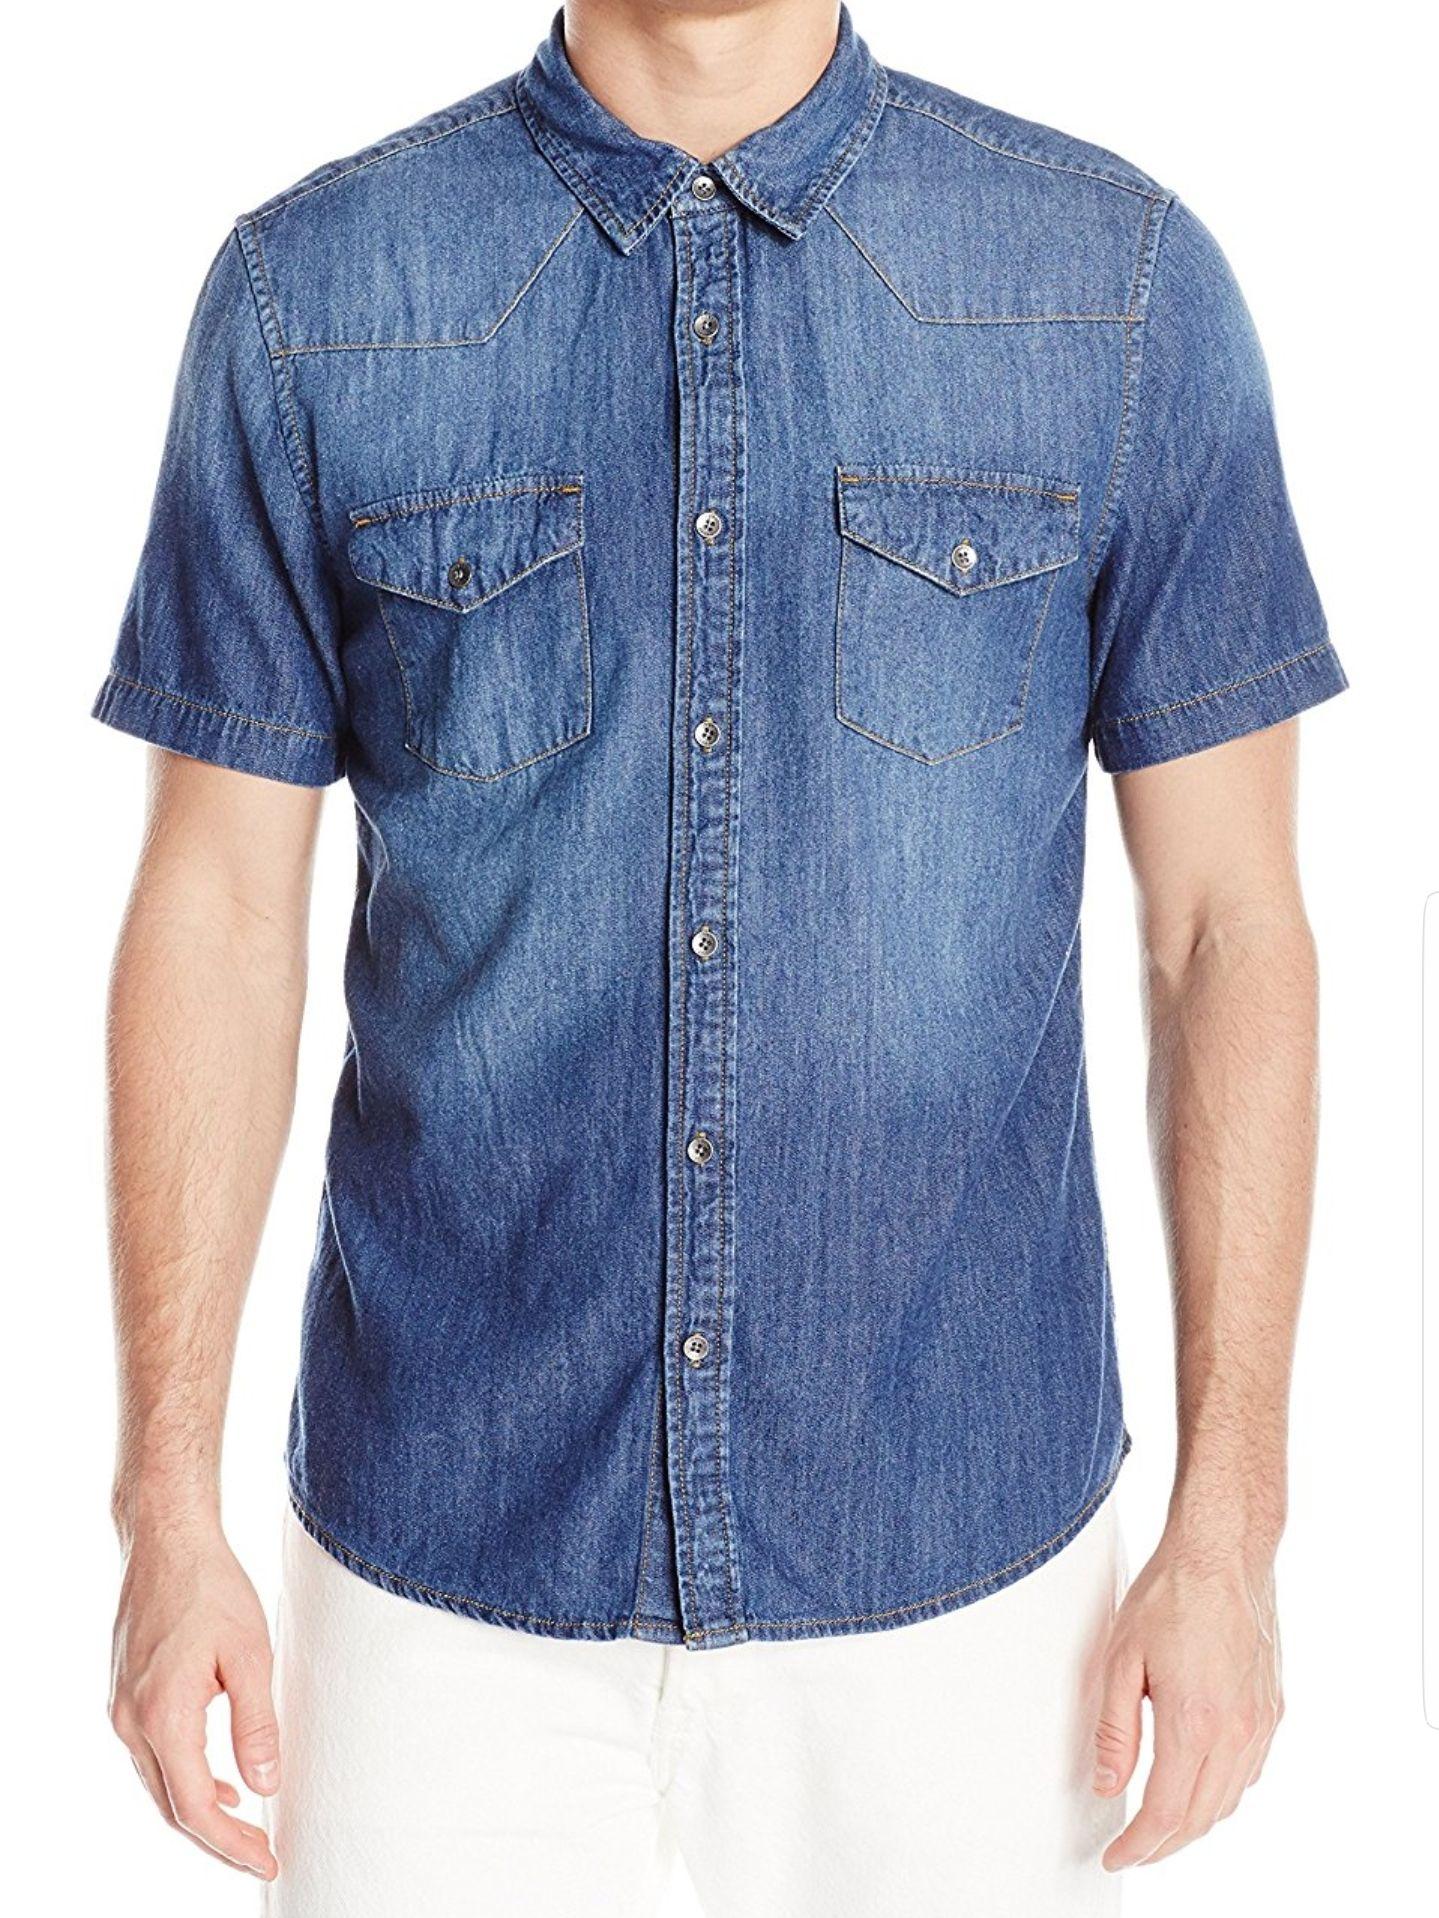 Amazon: Camisa Guess Slim Denim Shirt